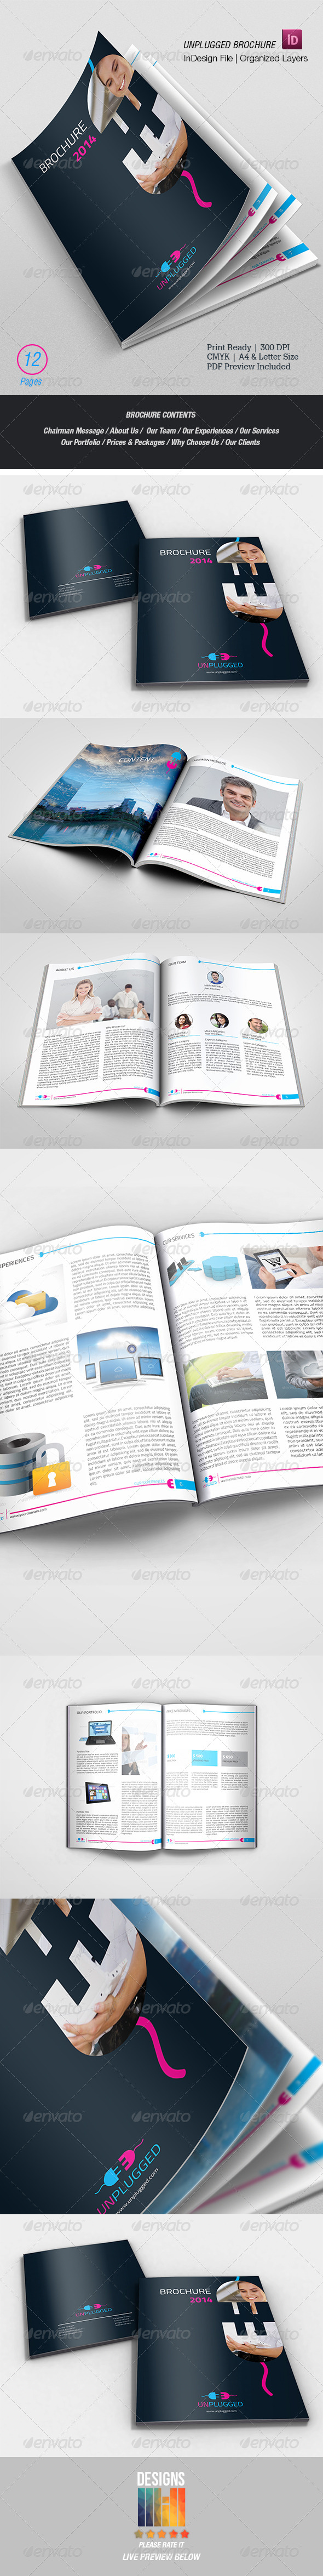 GraphicRiver UnPlugged Multipurpose Brochure 8551236